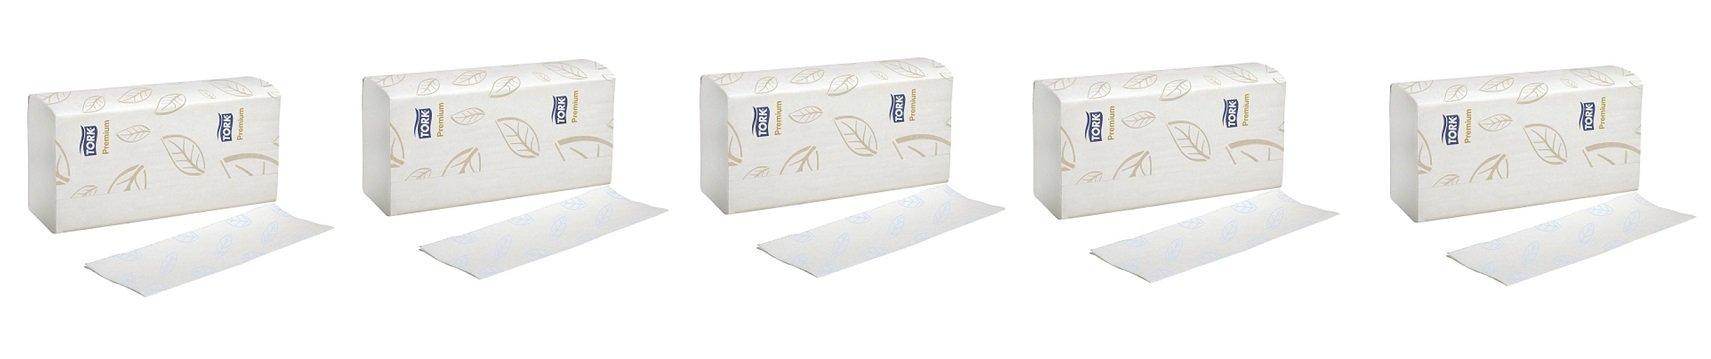 Tork MB578 Xpress Premium Soft Multifold 3-Panel 2-Ply Hand Towel, White (5-(16 Packs))